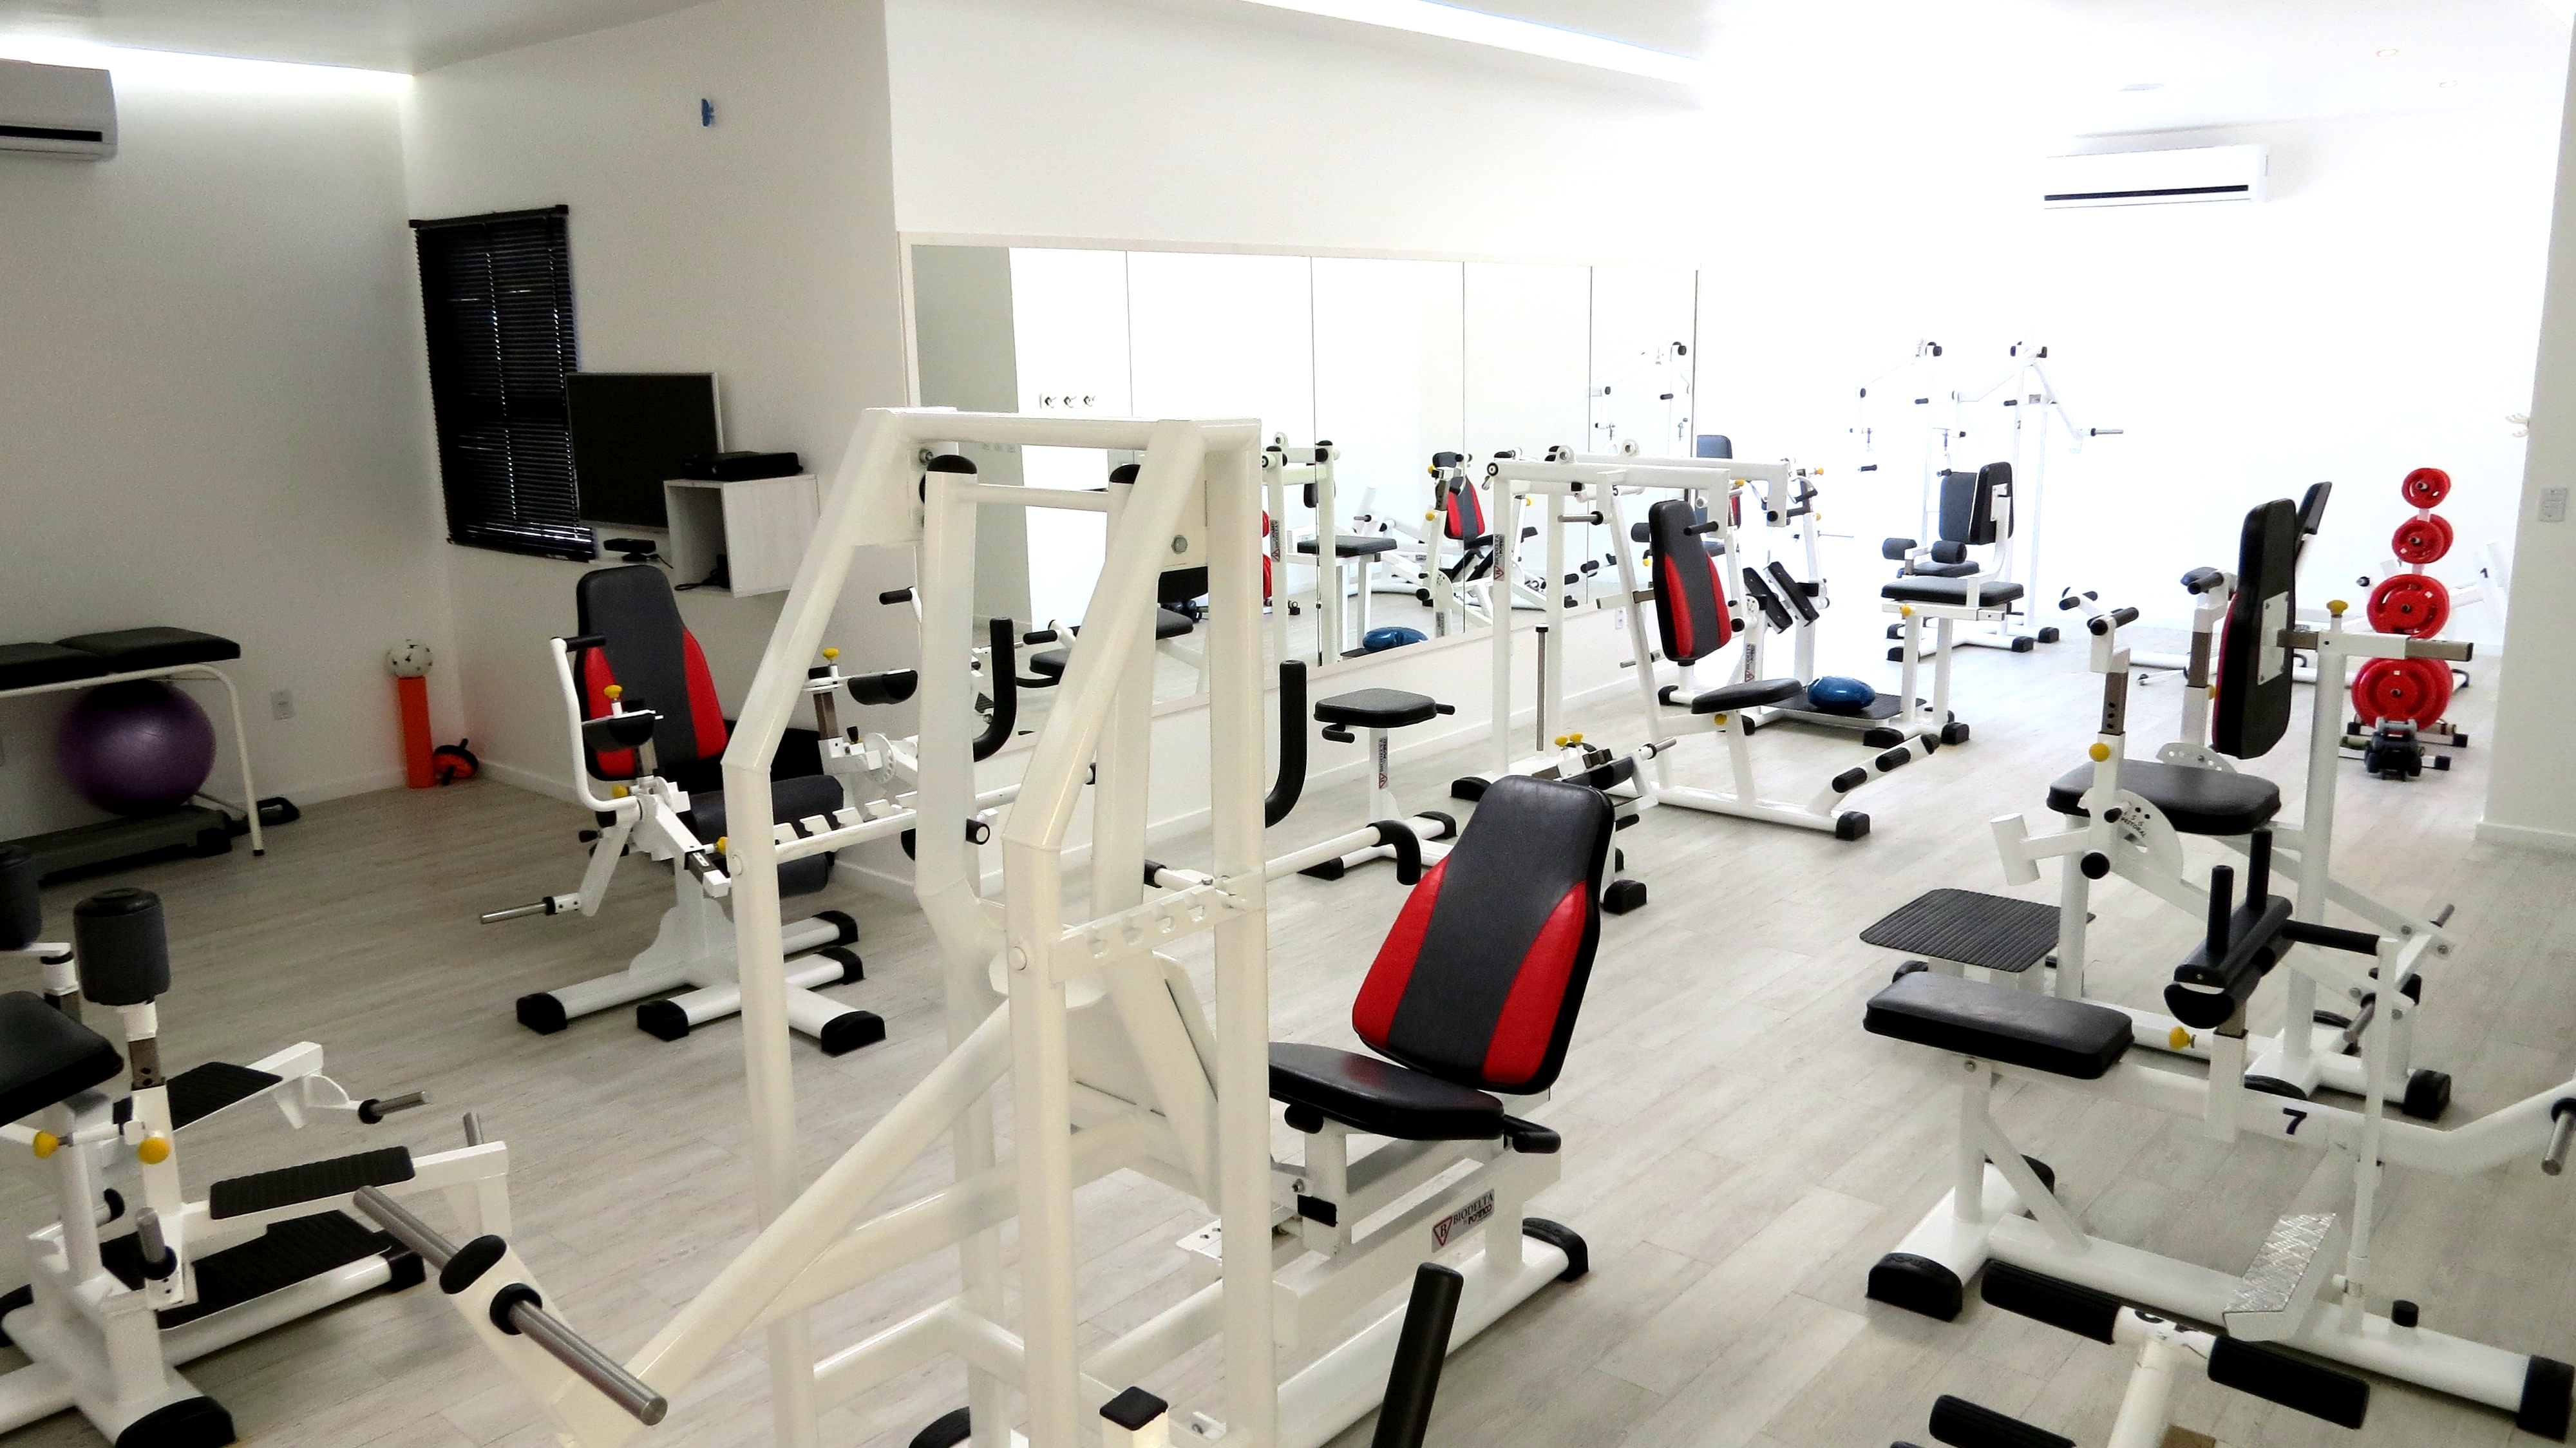 Fisio Força- Exercício terapeutico